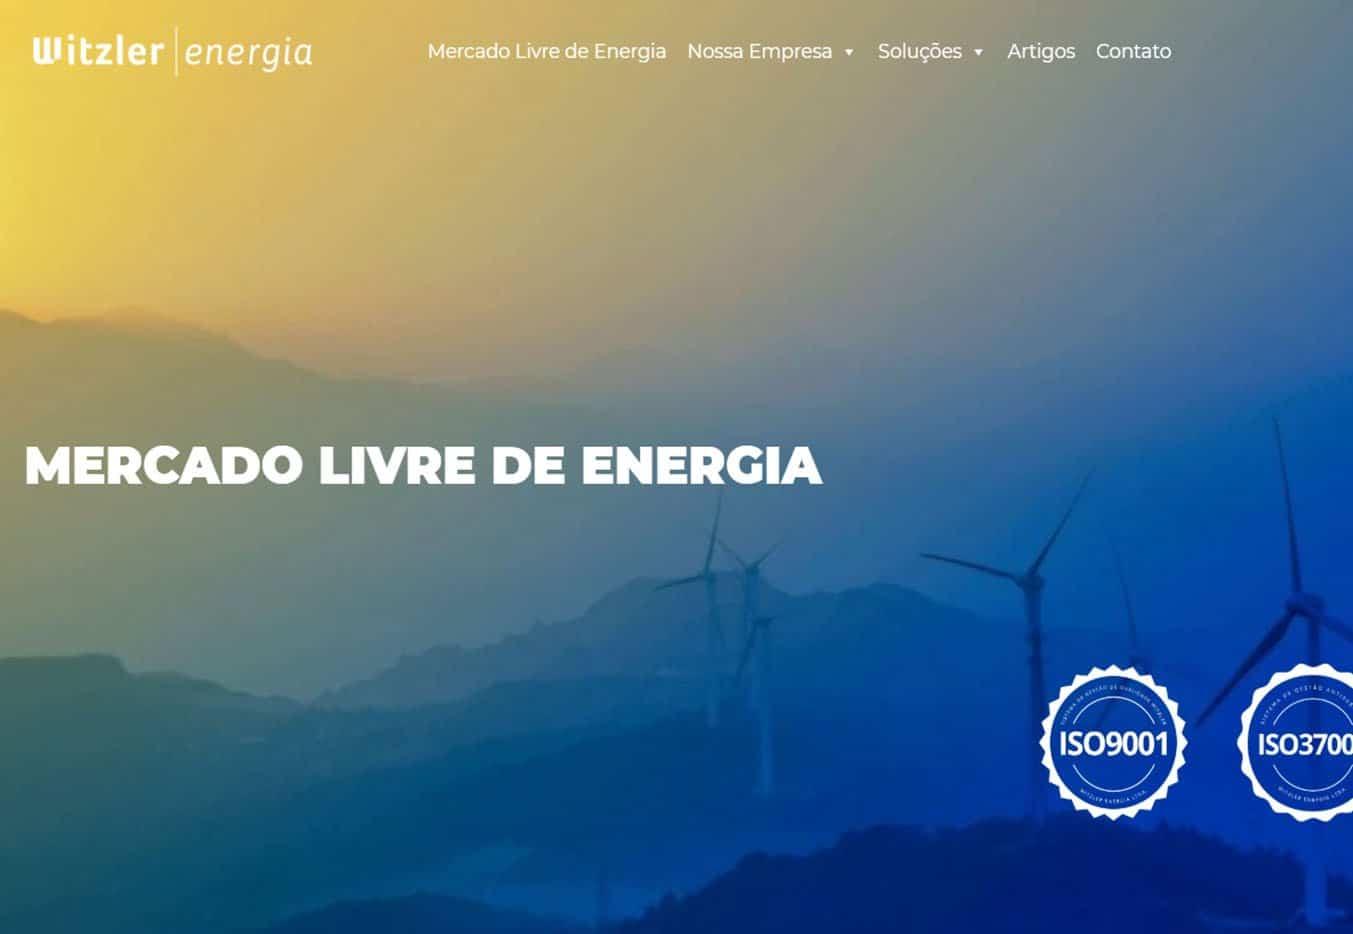 Witzler Energia